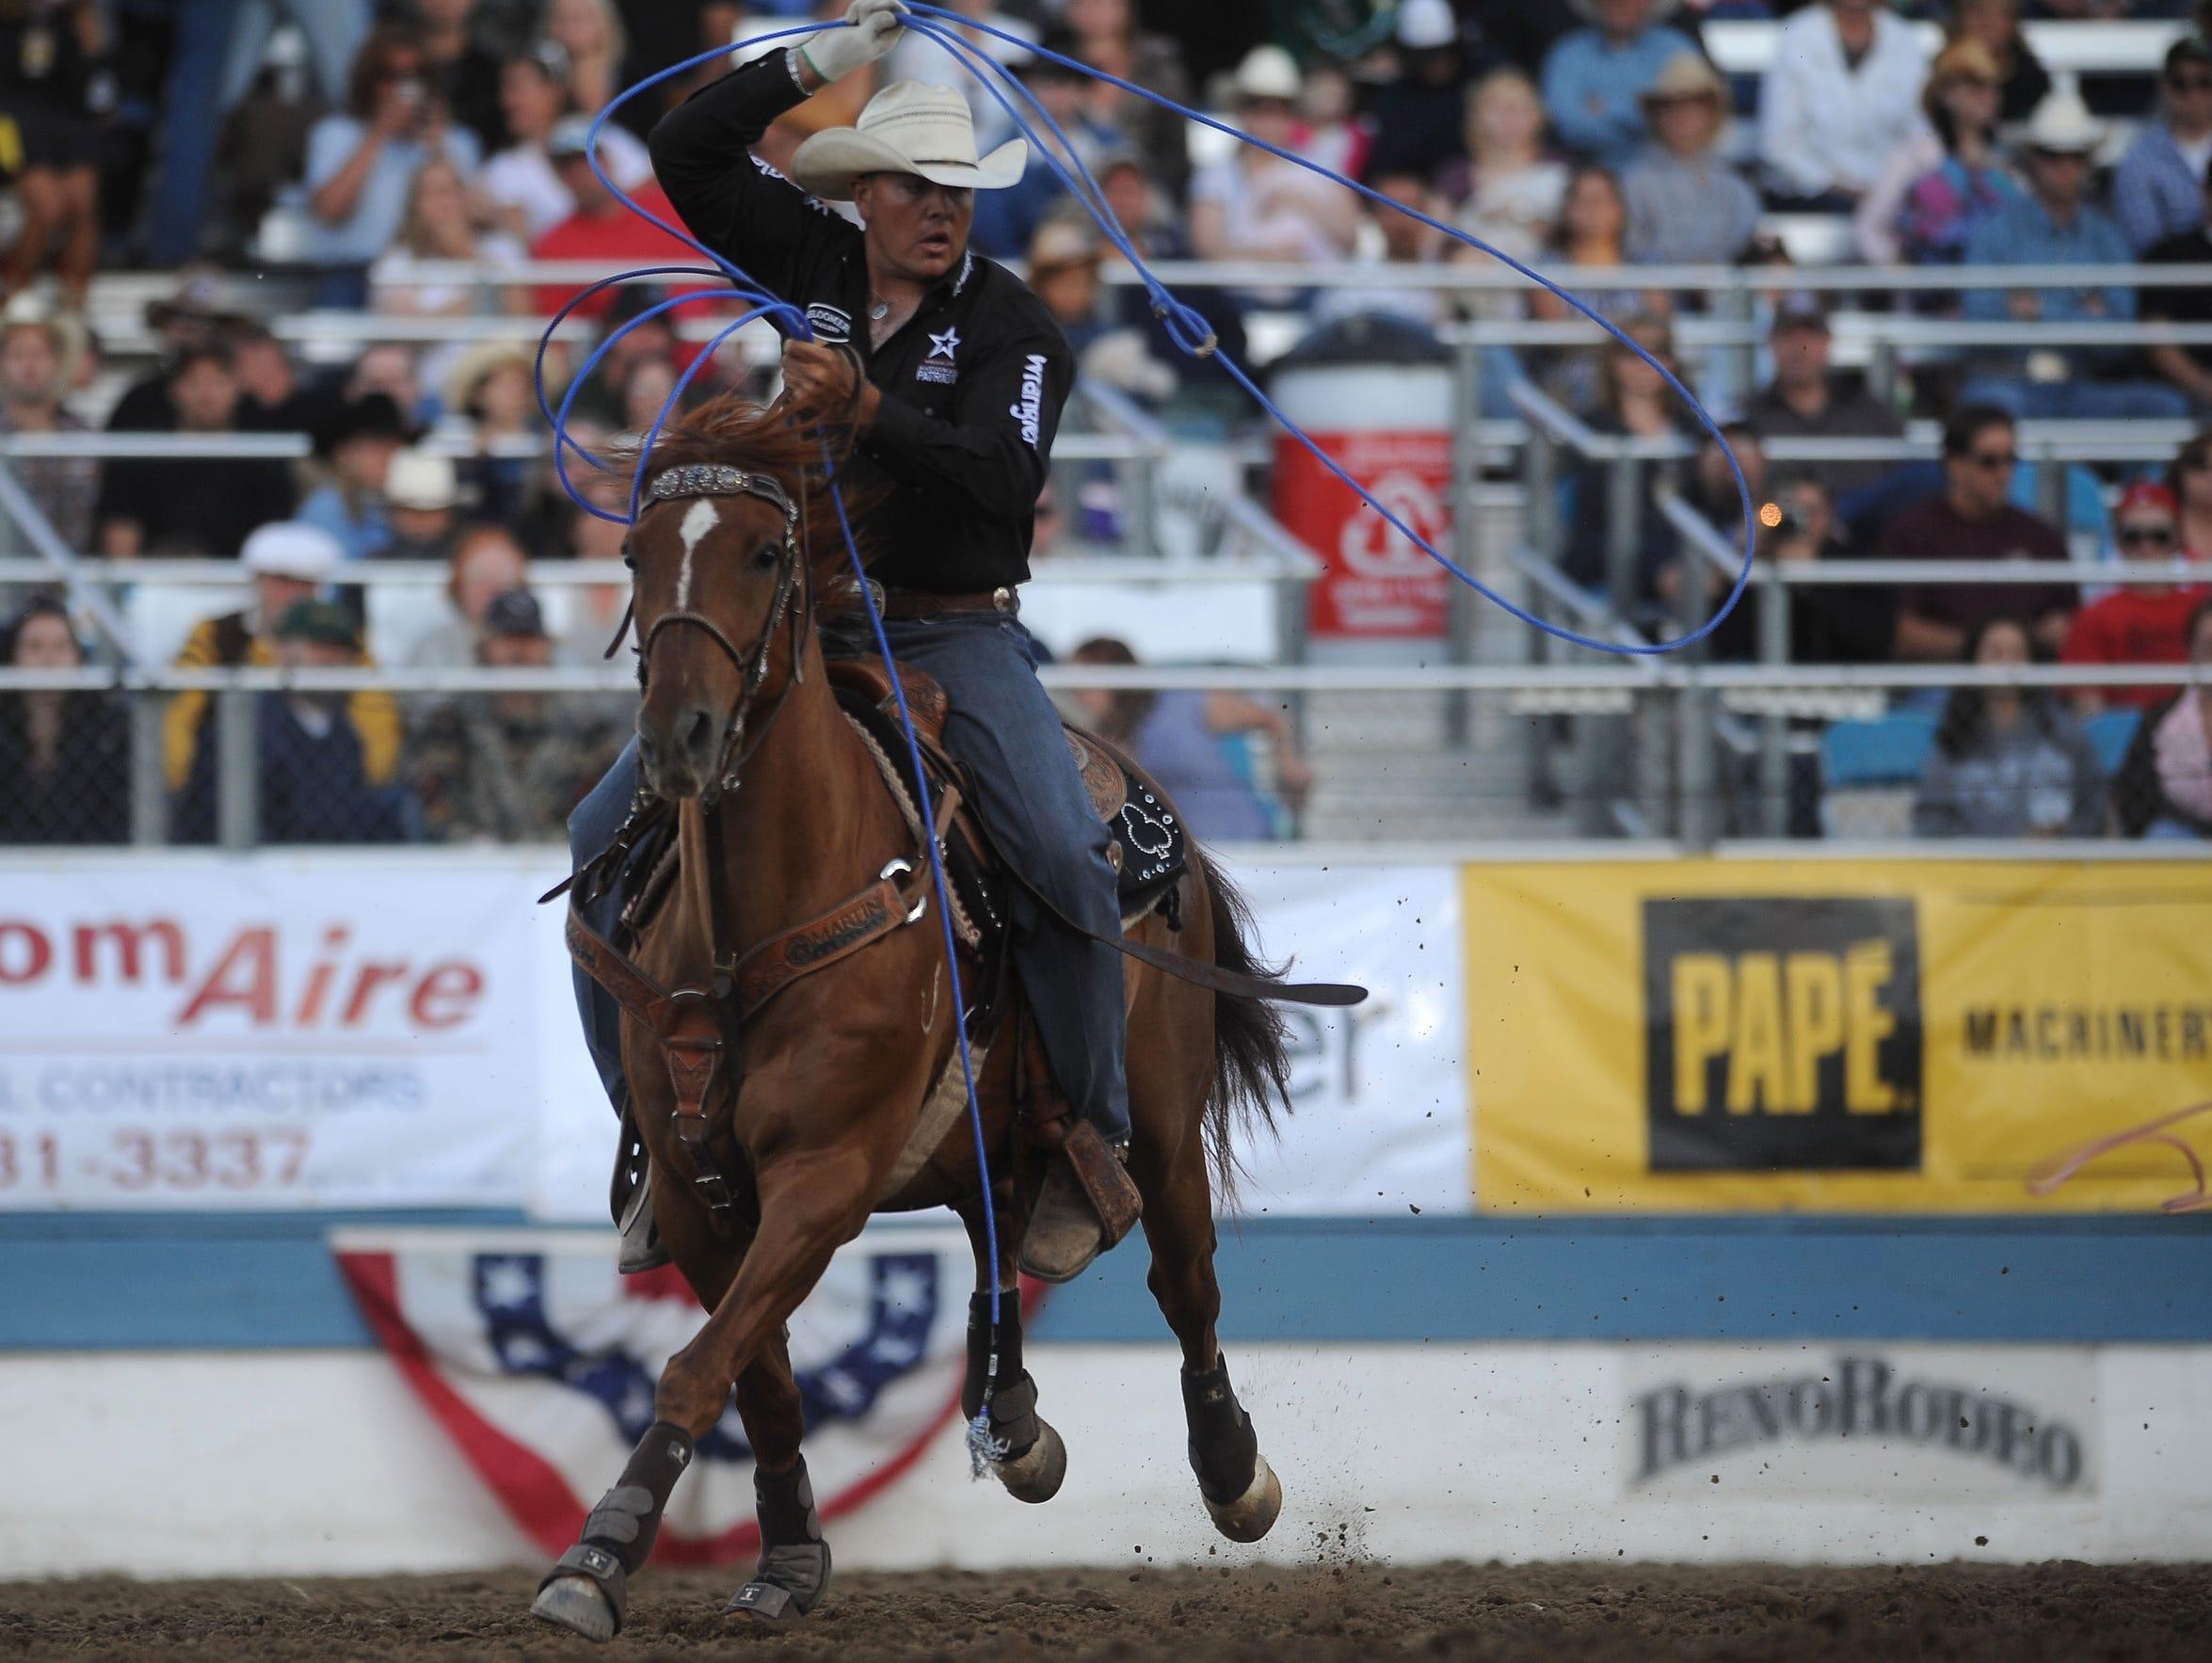 Fallon's Jade Corkill won back-to-back world championships.